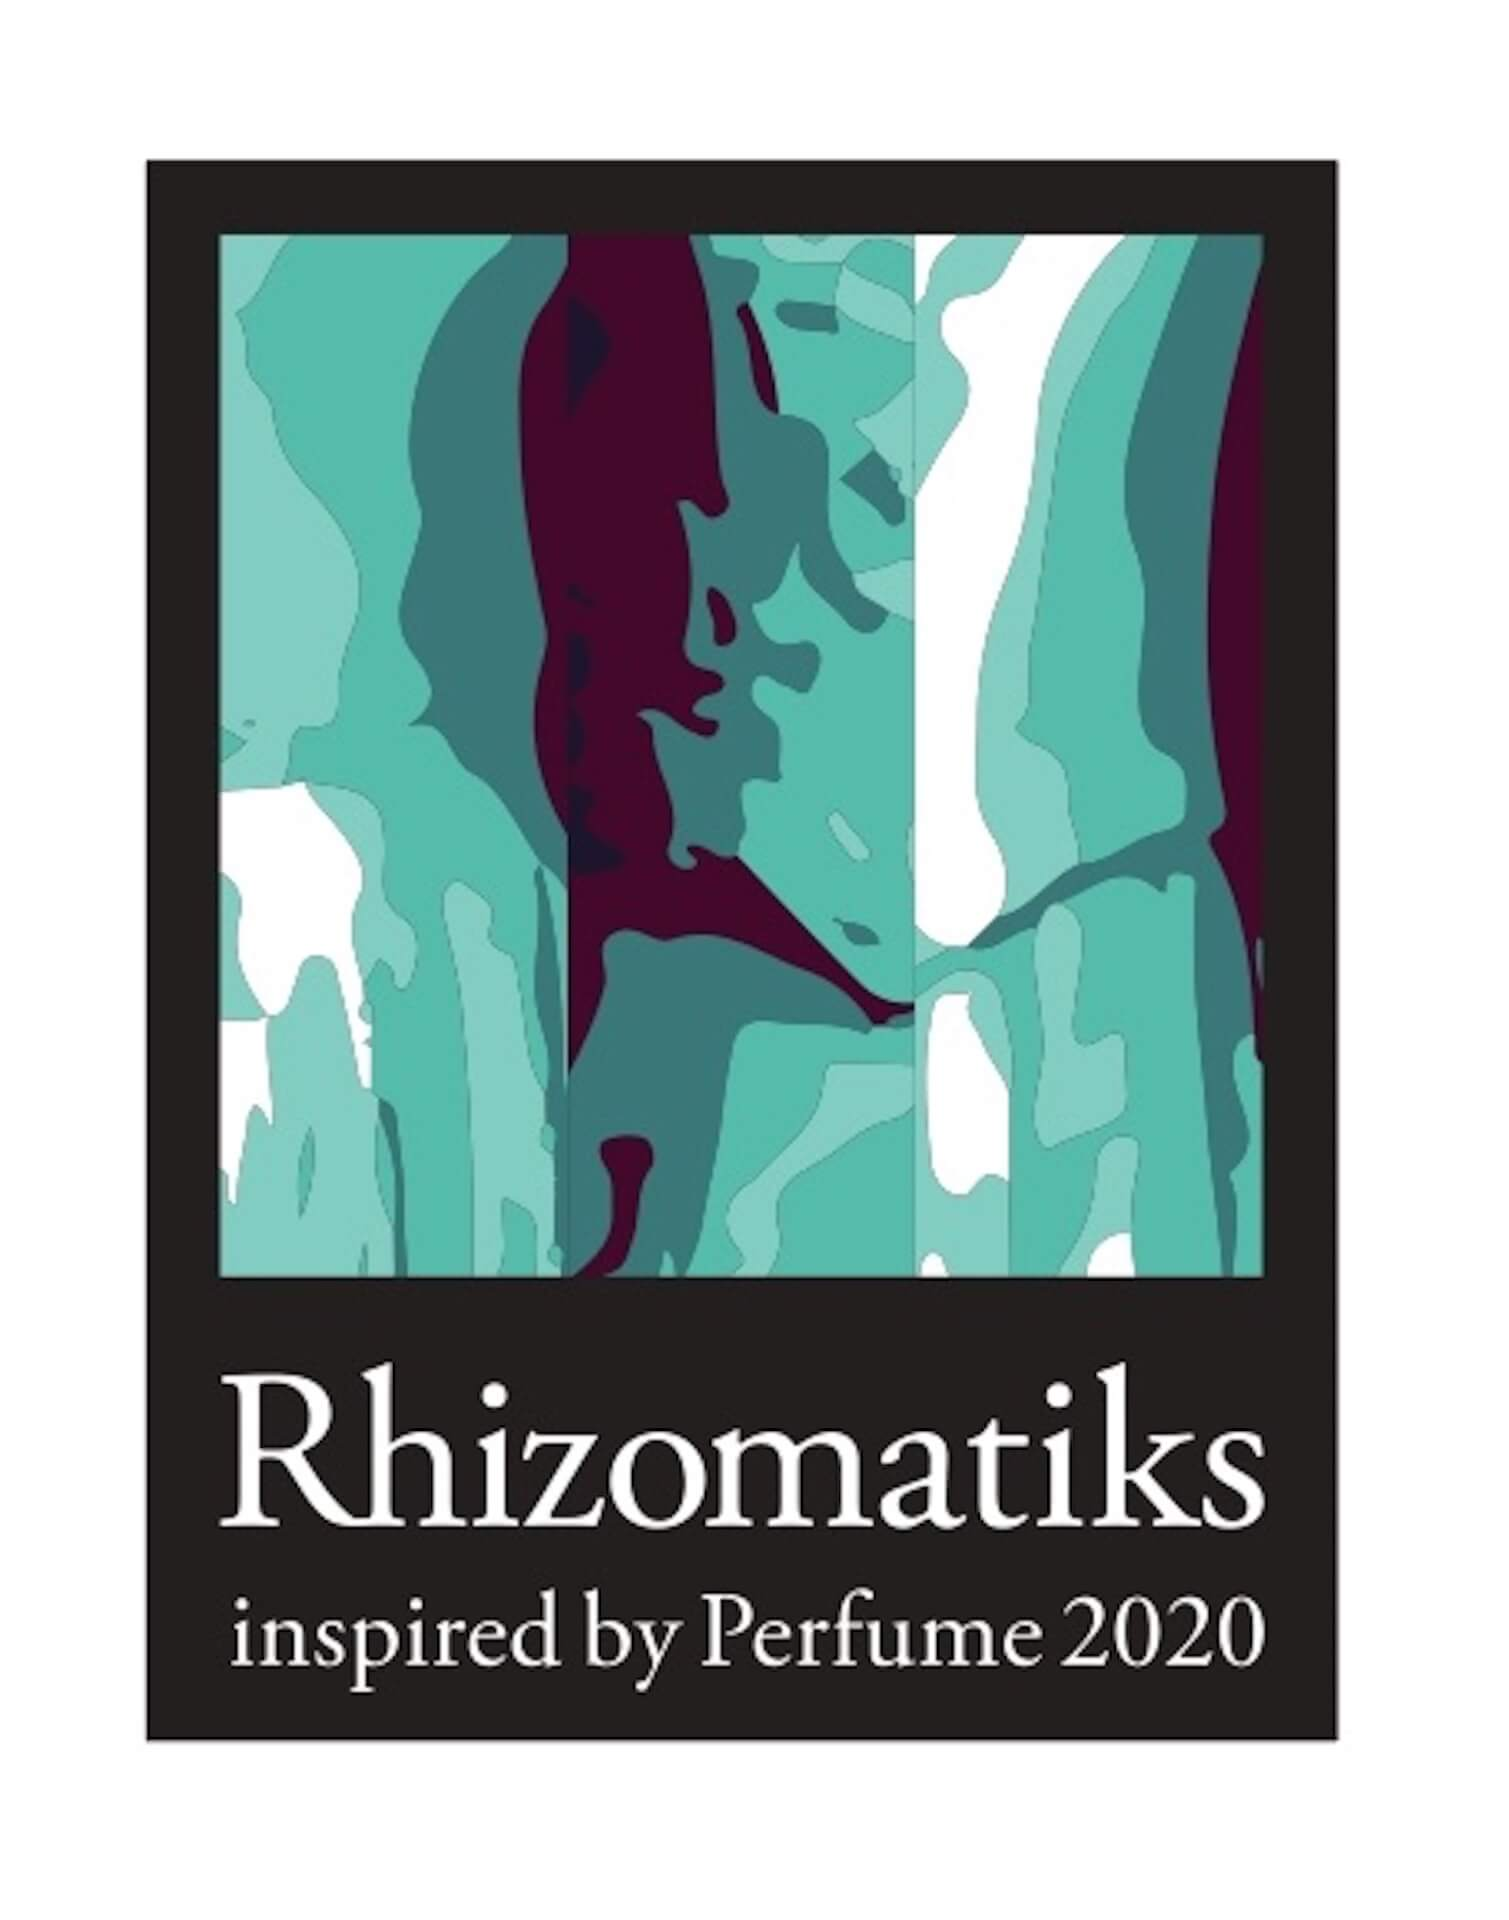 Perfume舞台演出の裏側を体験!<Rhizomatiks inspired by Perfume 2020>が渋谷PARCO MUSEUMで開催! ac200109_rhizomatiksparco_10